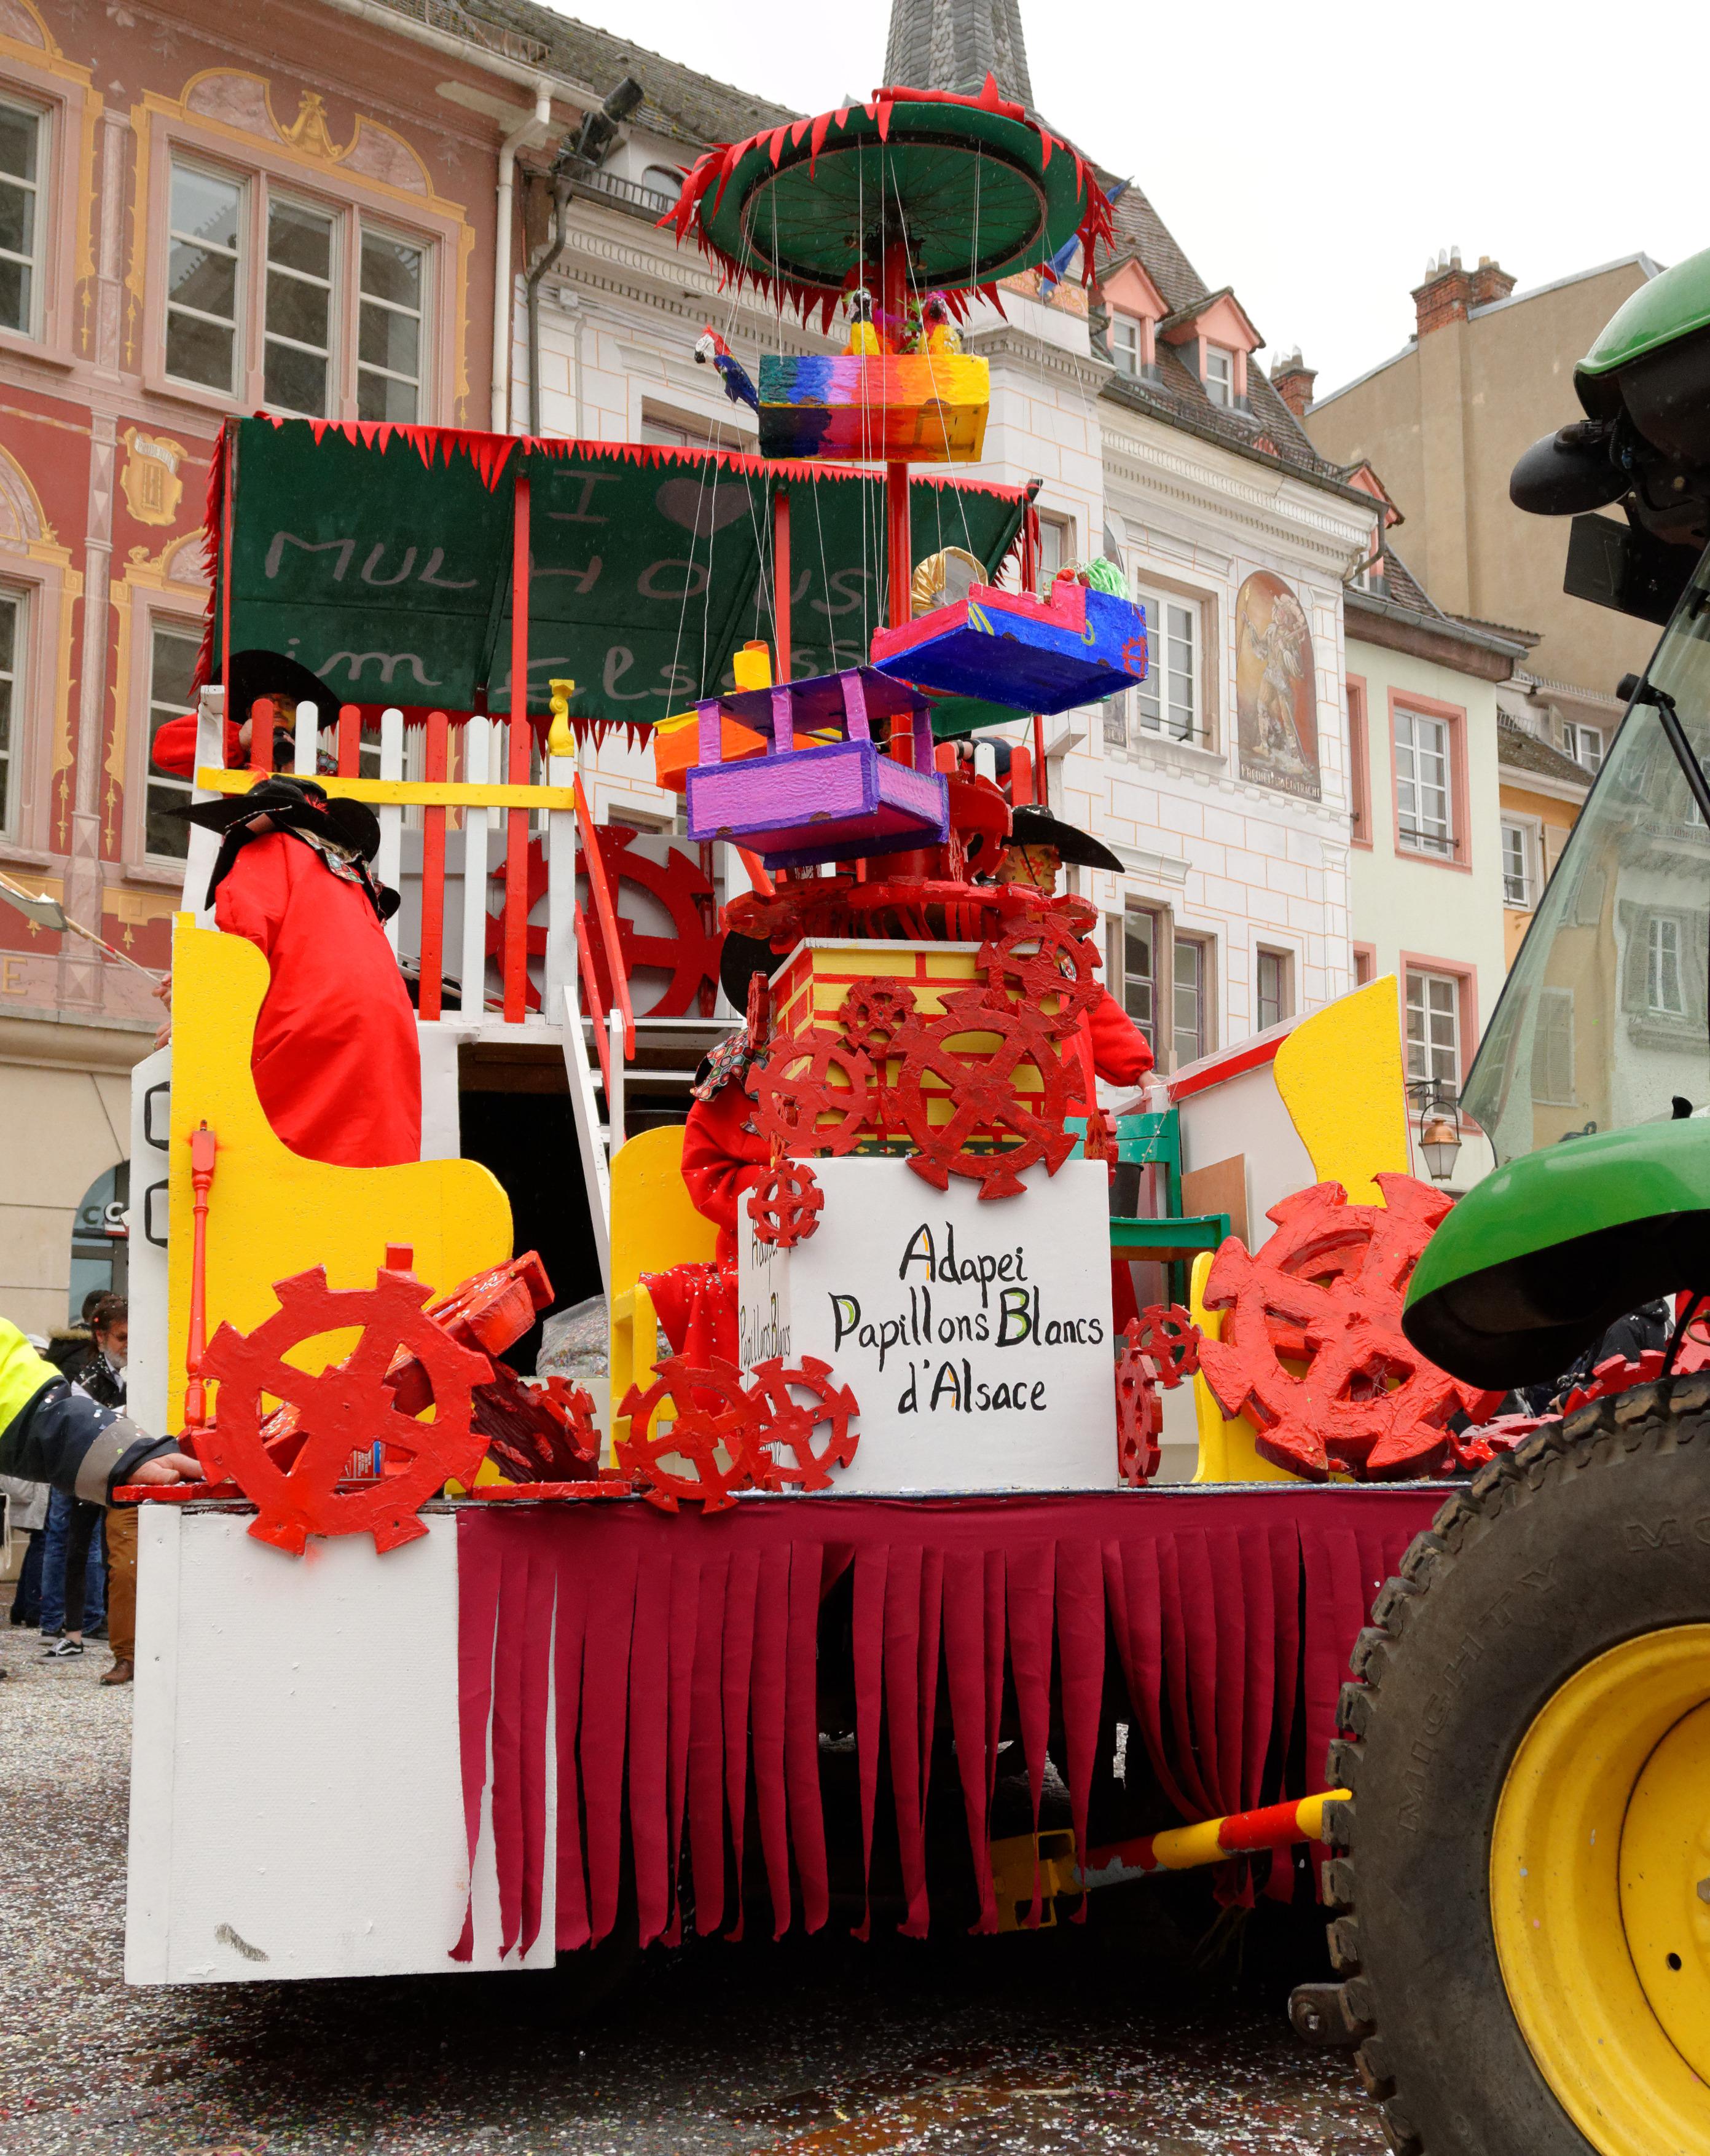 File2019 03 09 14 42 56 Carnaval Mulhousejpg Wikimedia